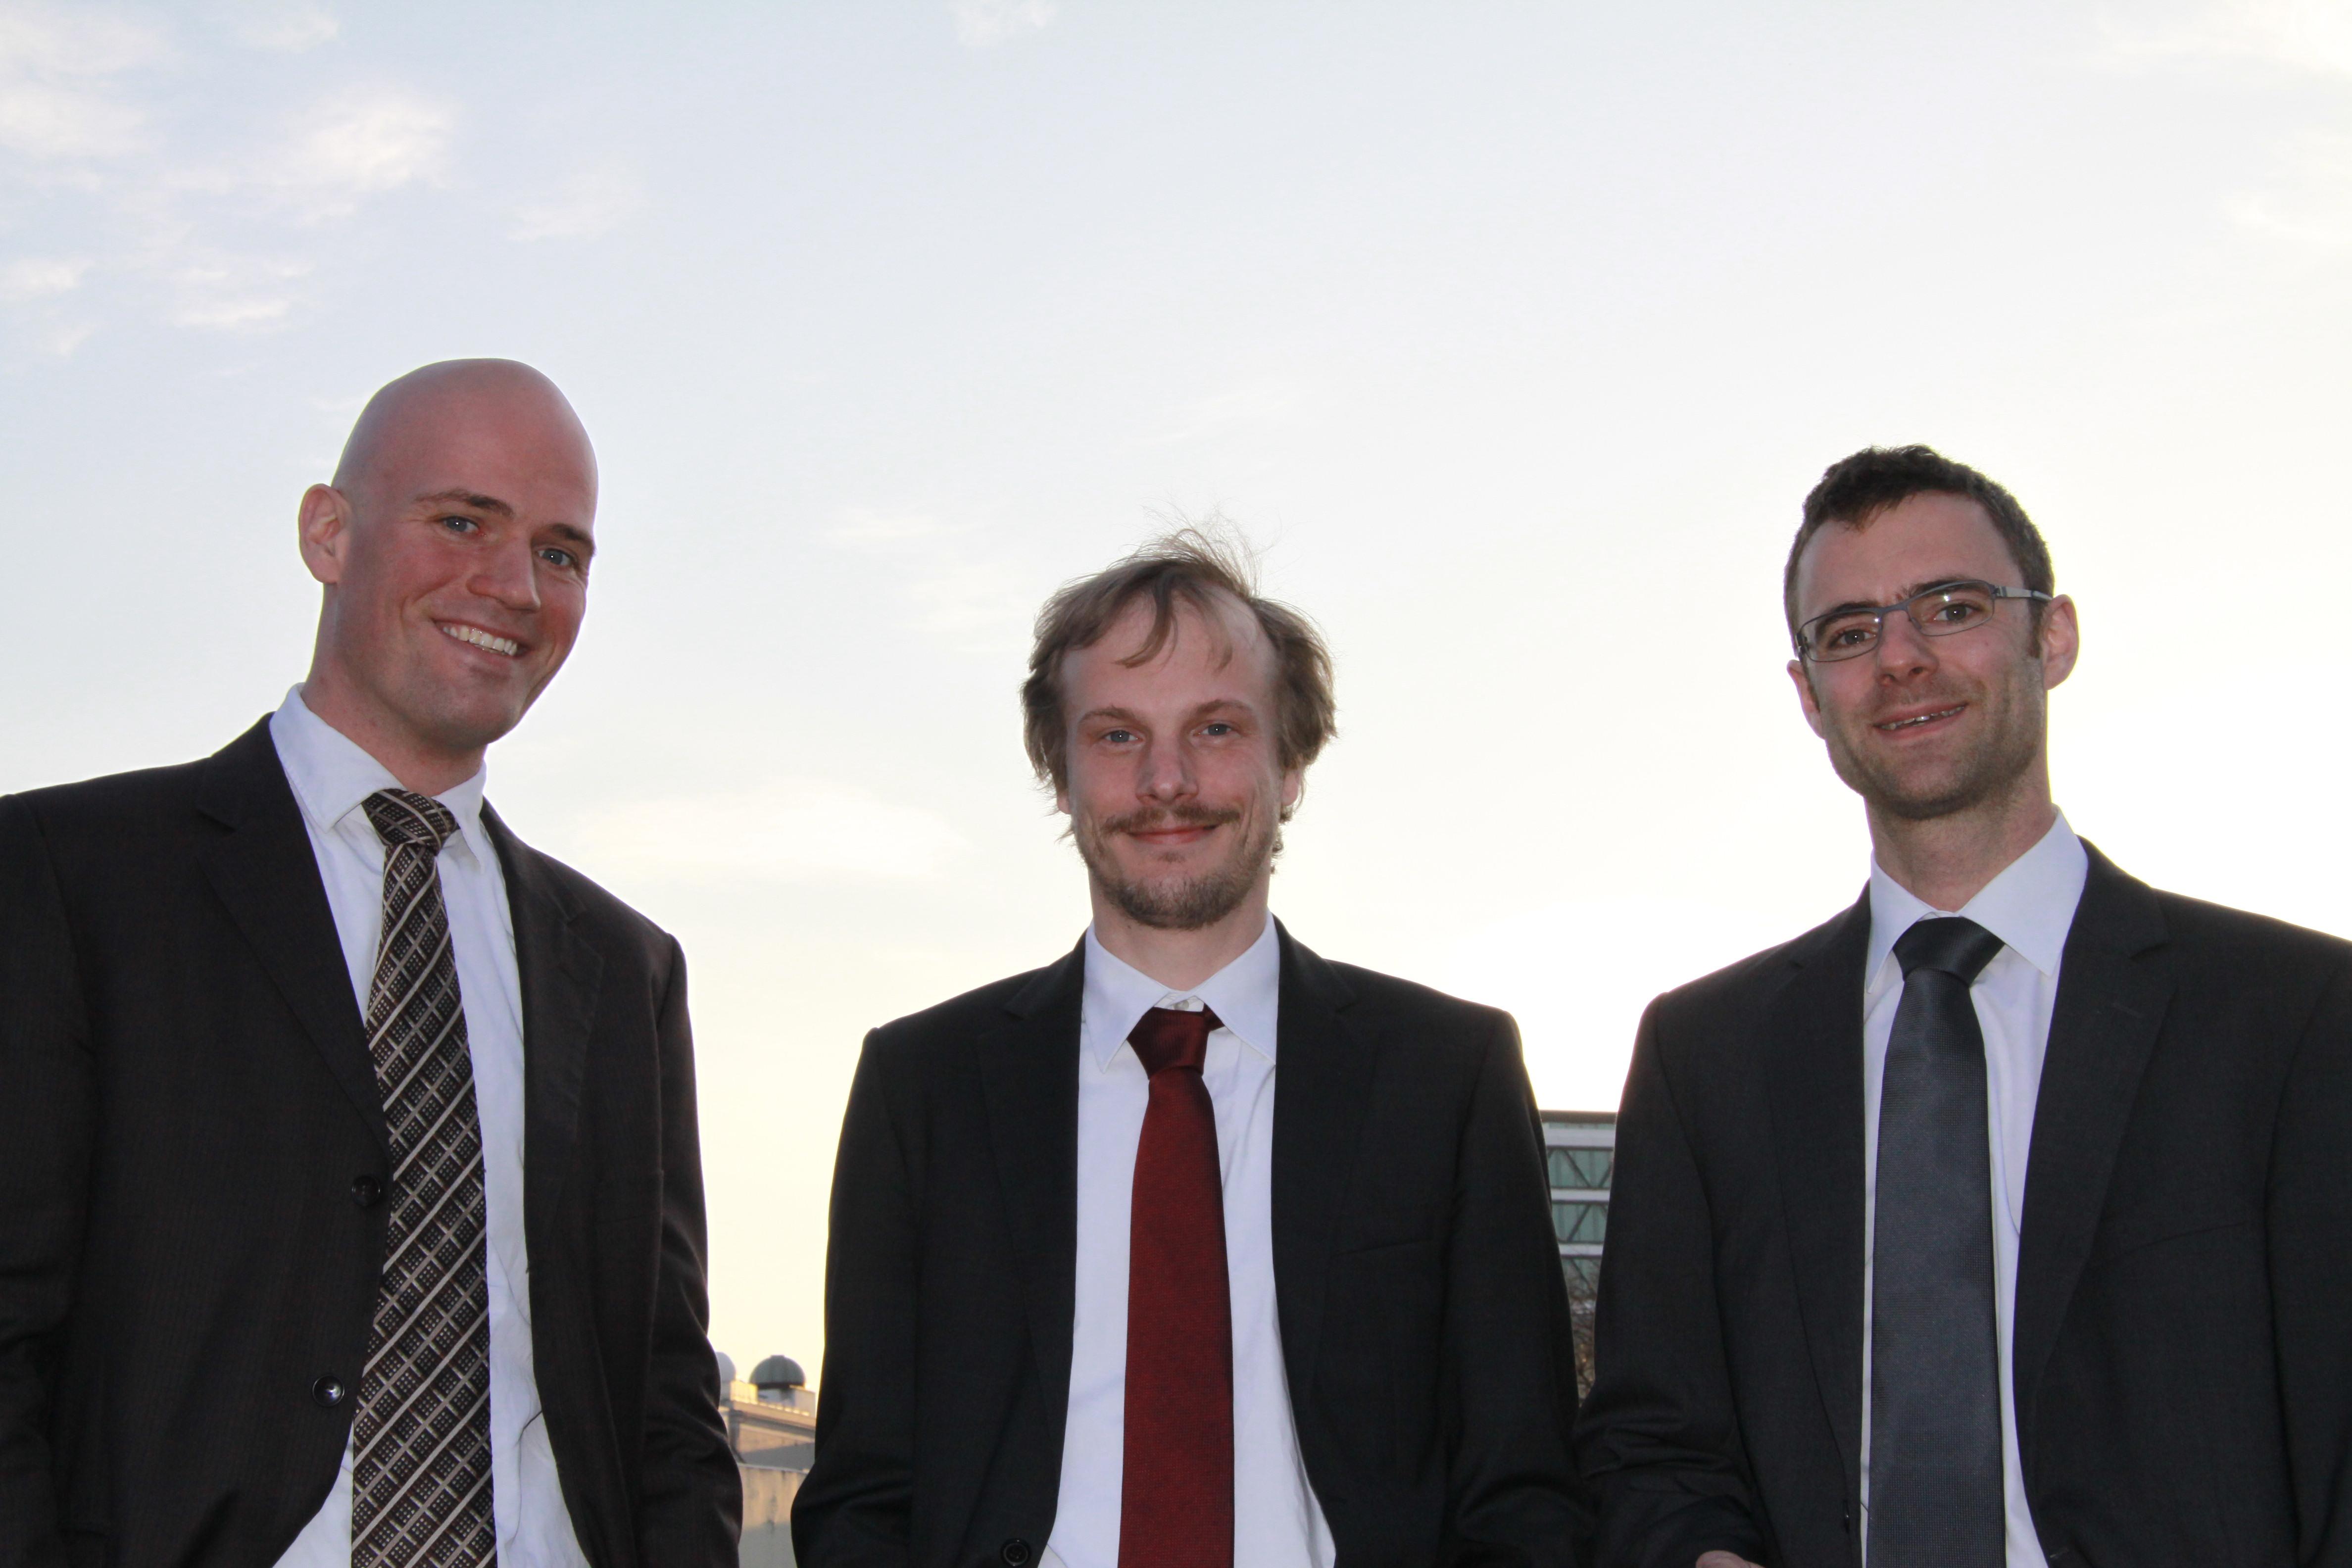 The founding team of EXTEND3D